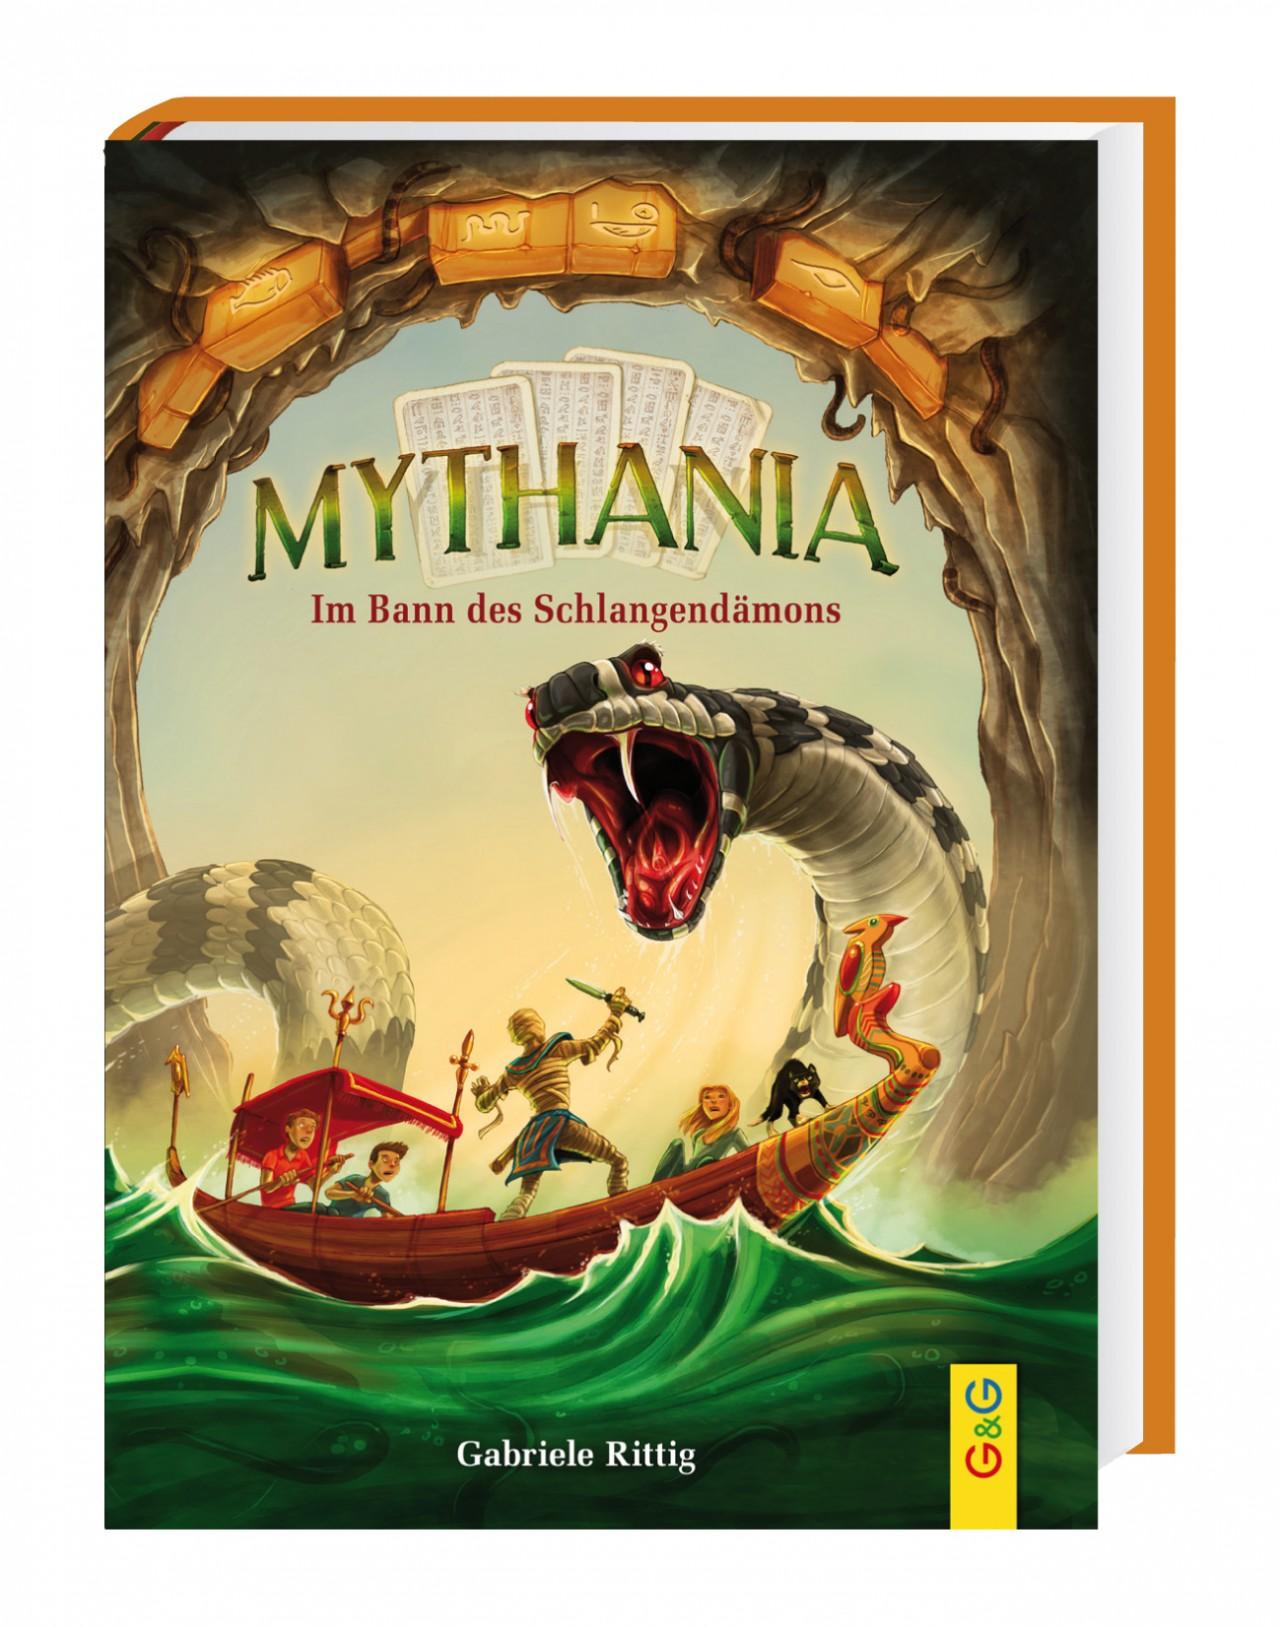 Lesung: Mythania - Im Bann des Schlangendämons © Verlag Ueberreuter